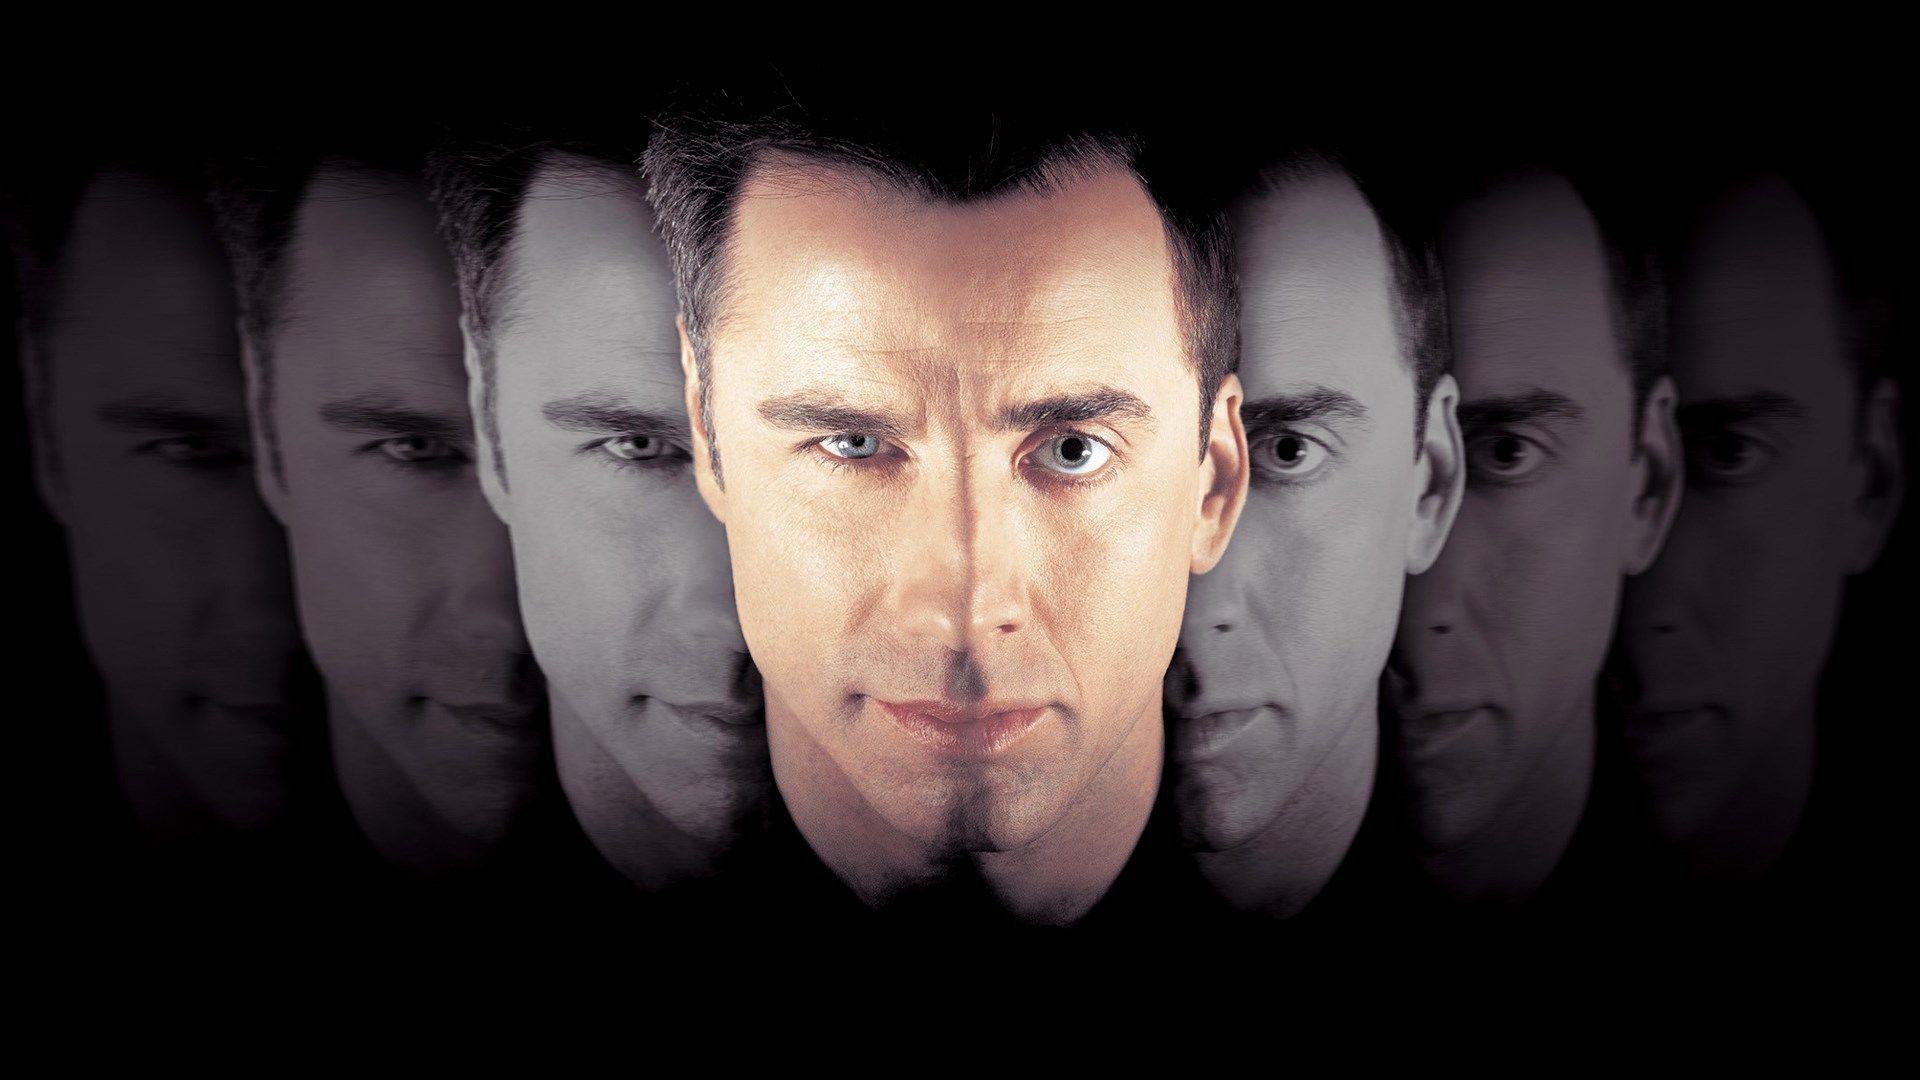 Wallpaper Desktop Faceoff Face Off John Travolta Nicolas Cage